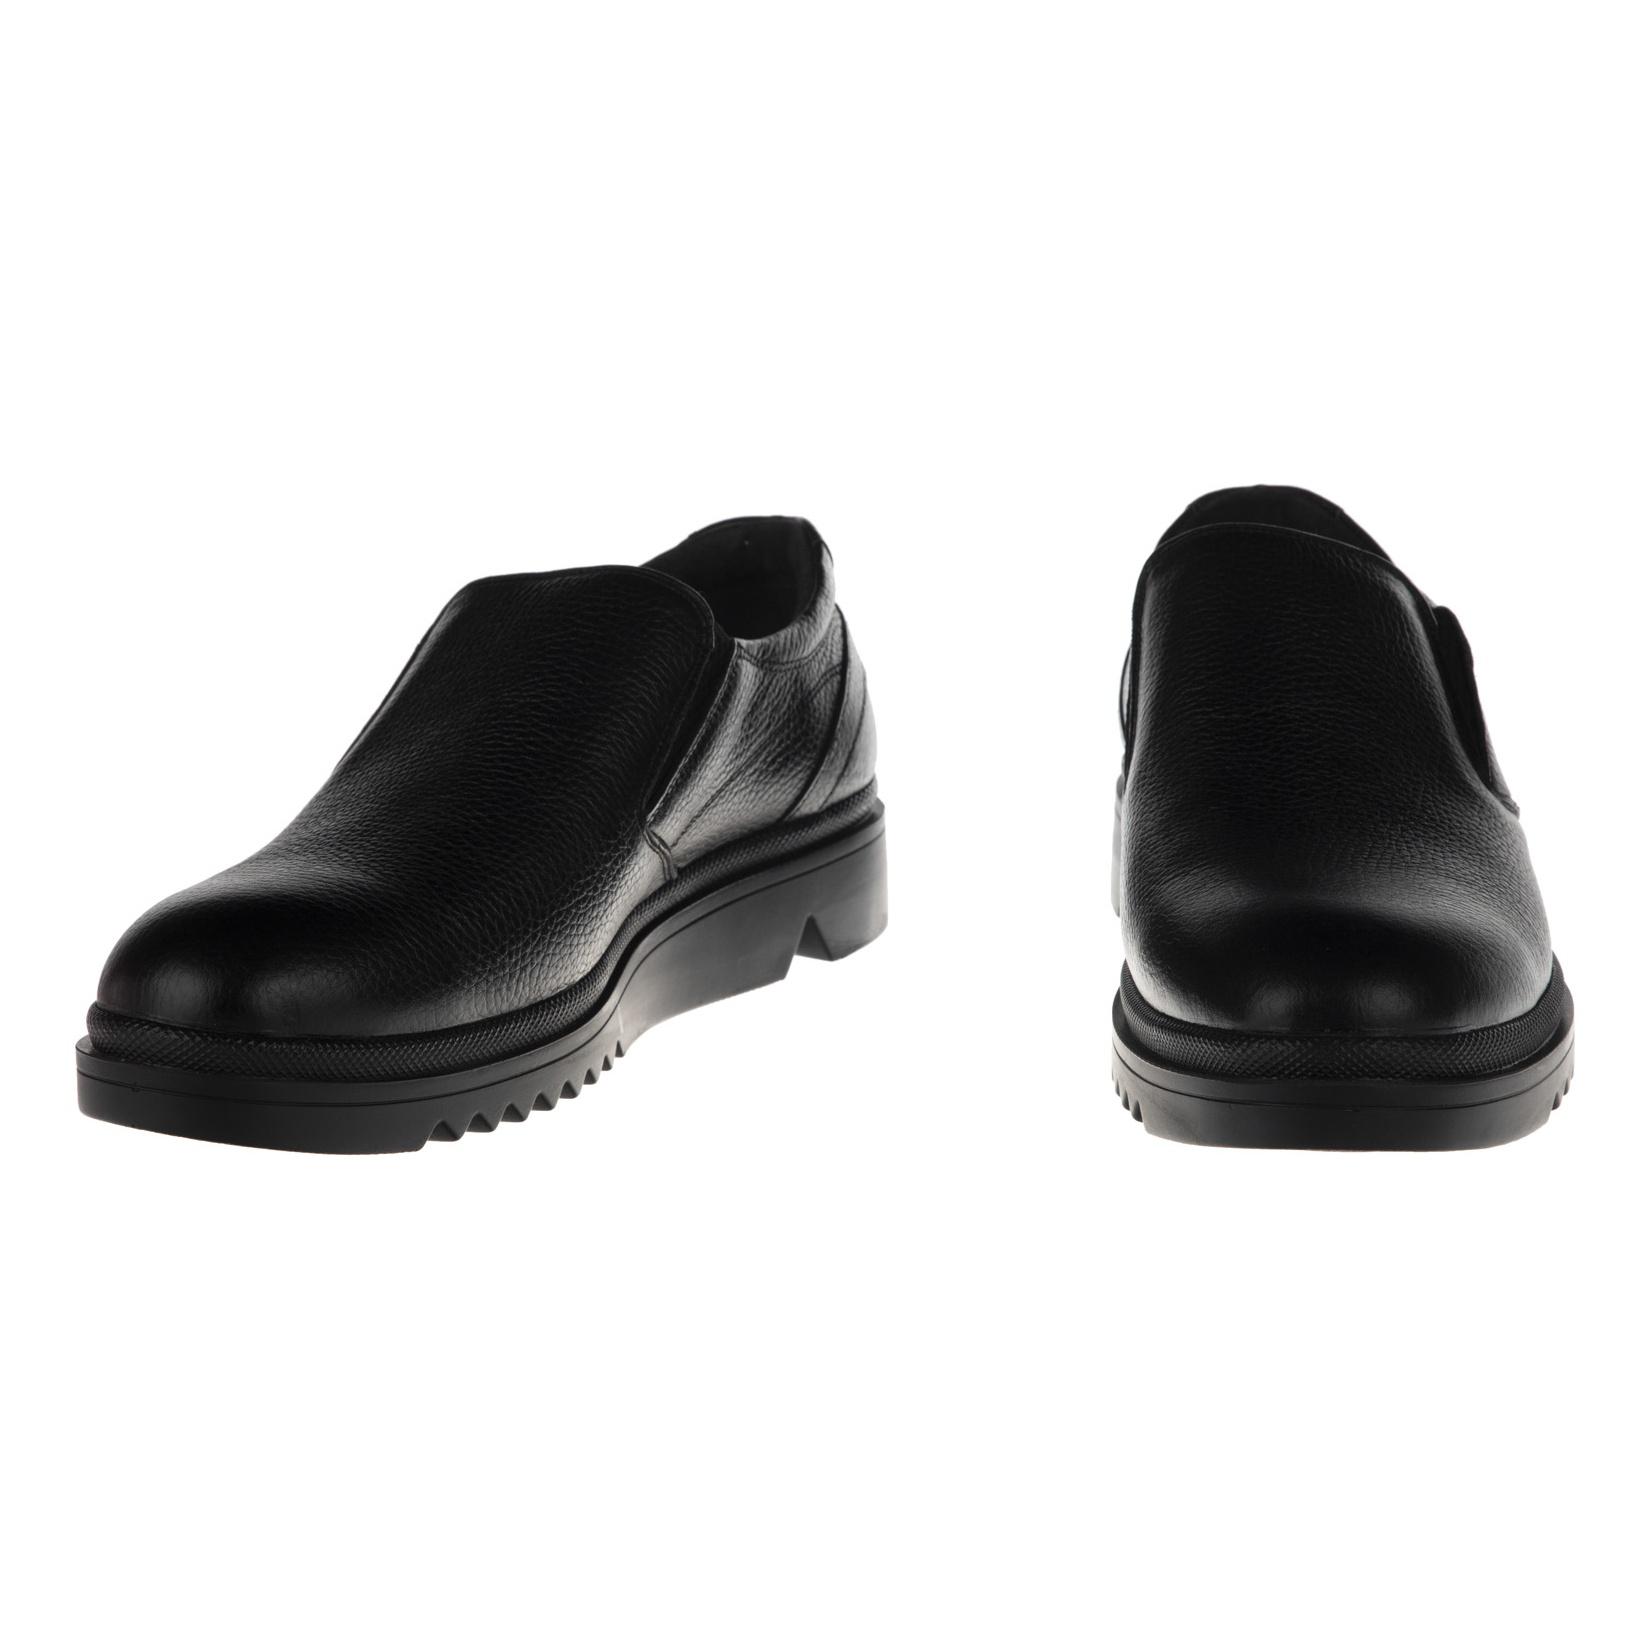 کفش روزمره مردانه شیفر مدل 7160A-101 -  - 7